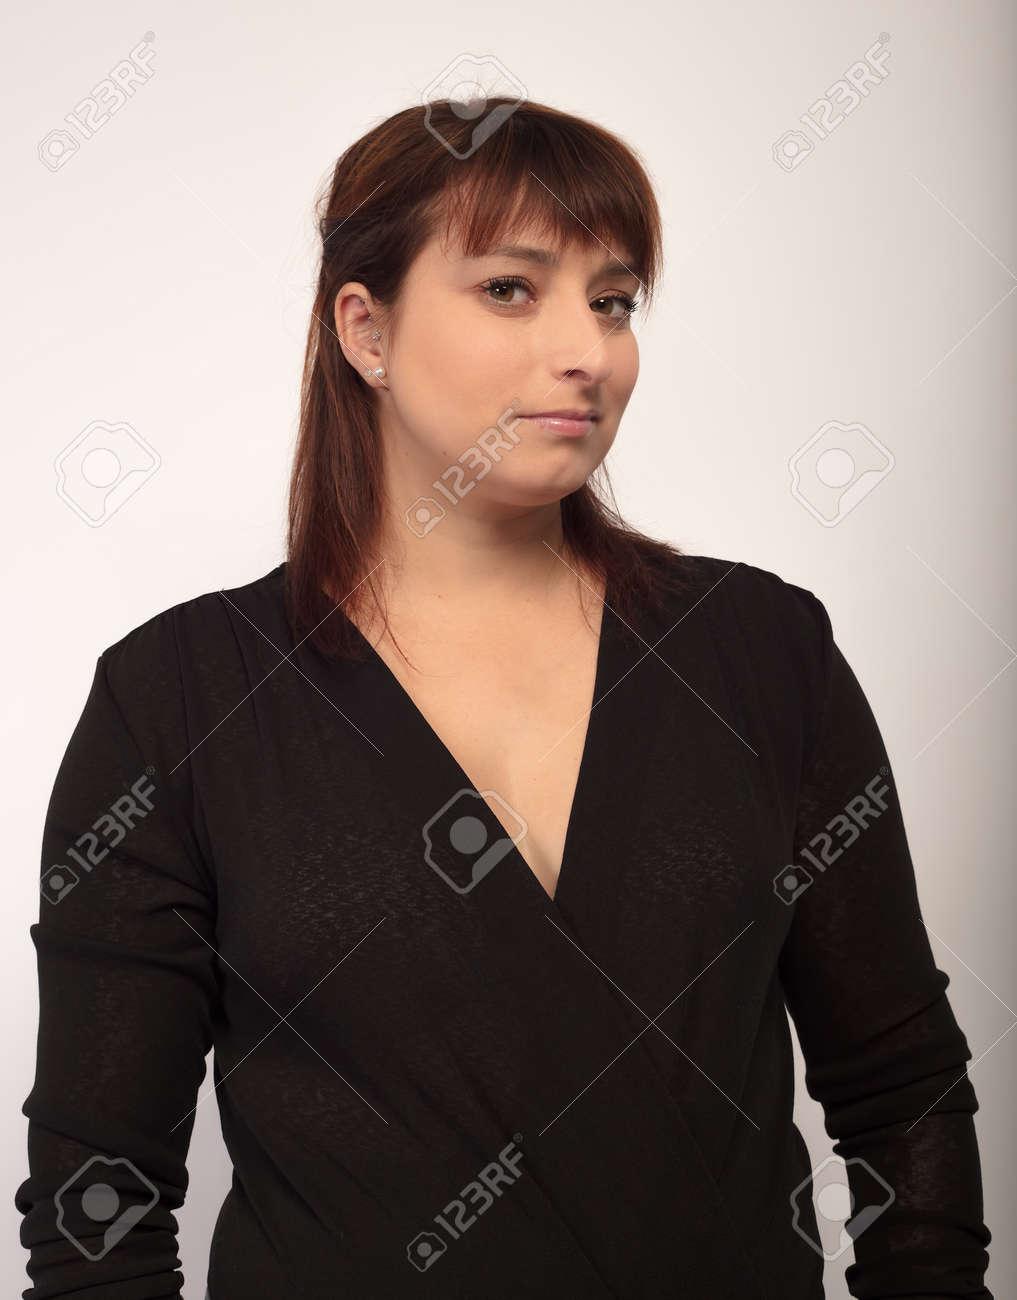 business portrait woman in black dress vertical businesswoman in studio - 158723248